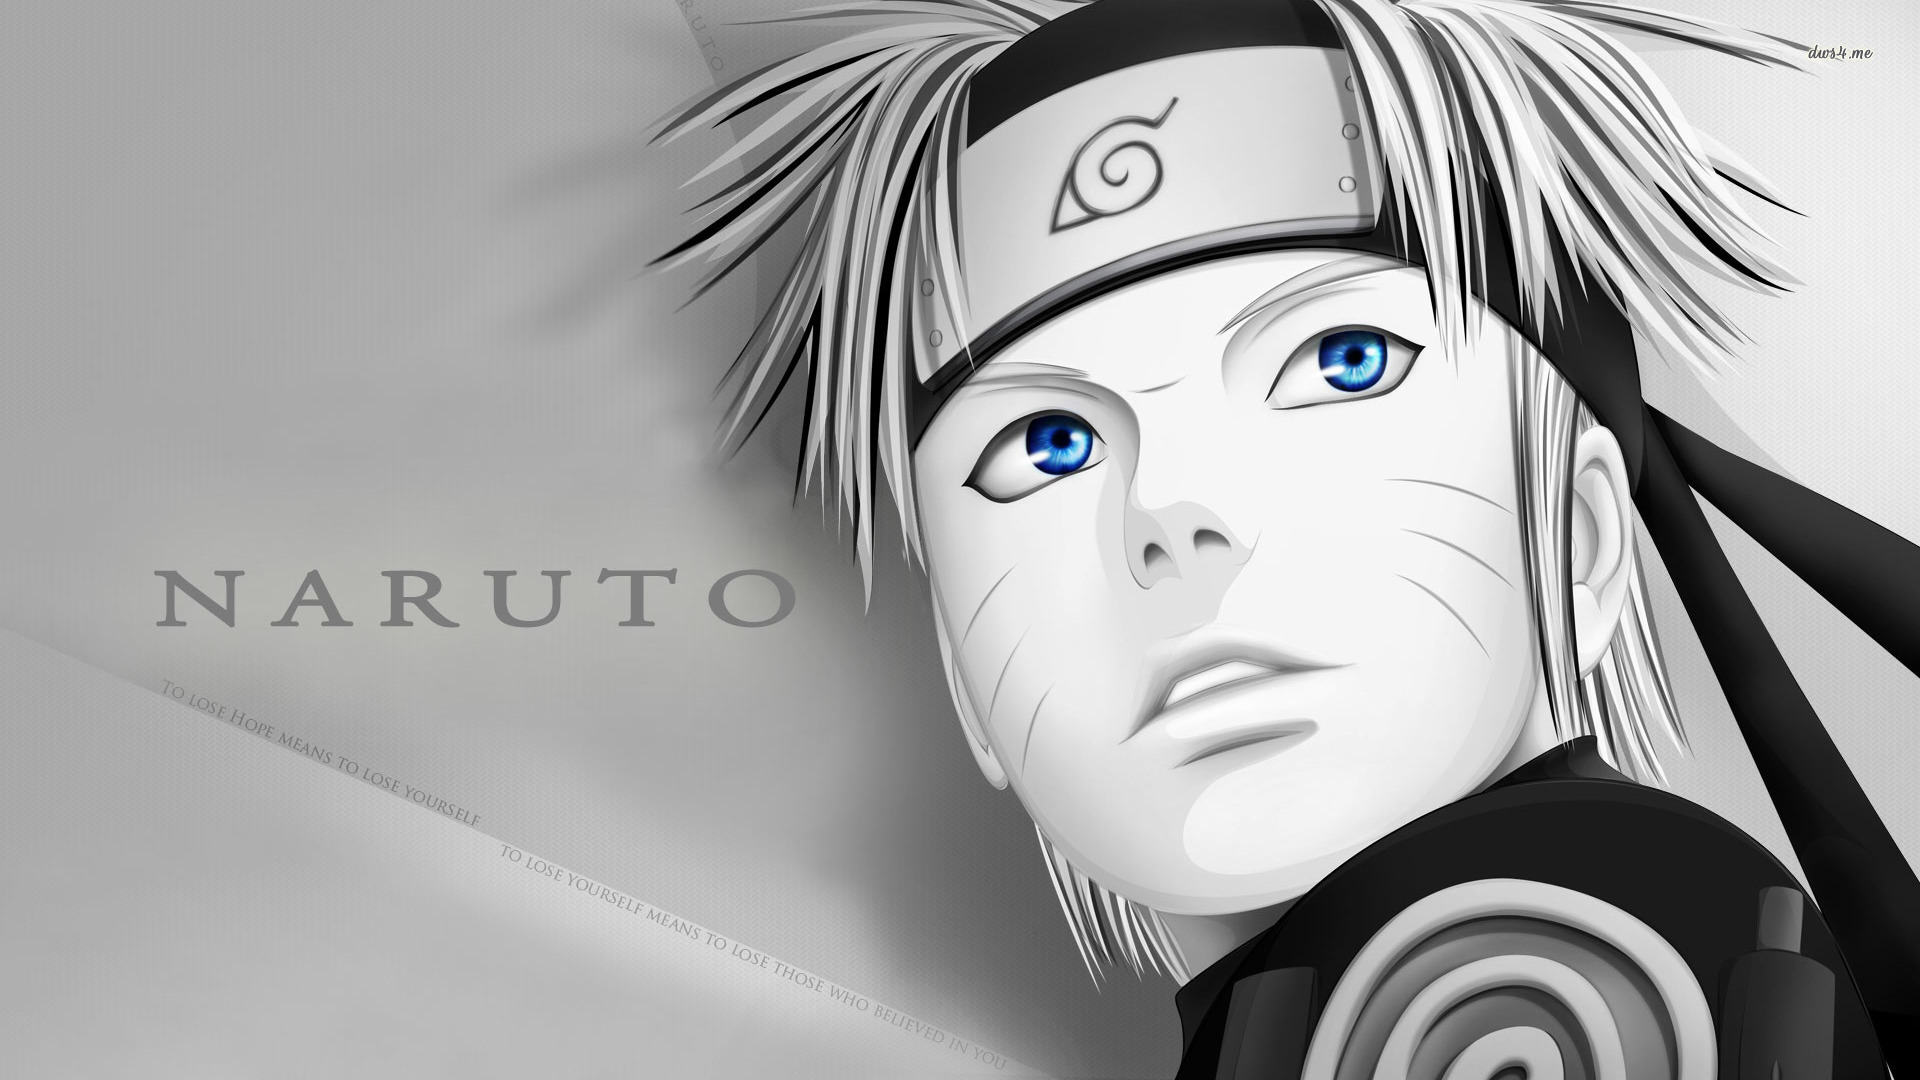 Naruto Wallpaper Blanco y Negro  Rincon Util